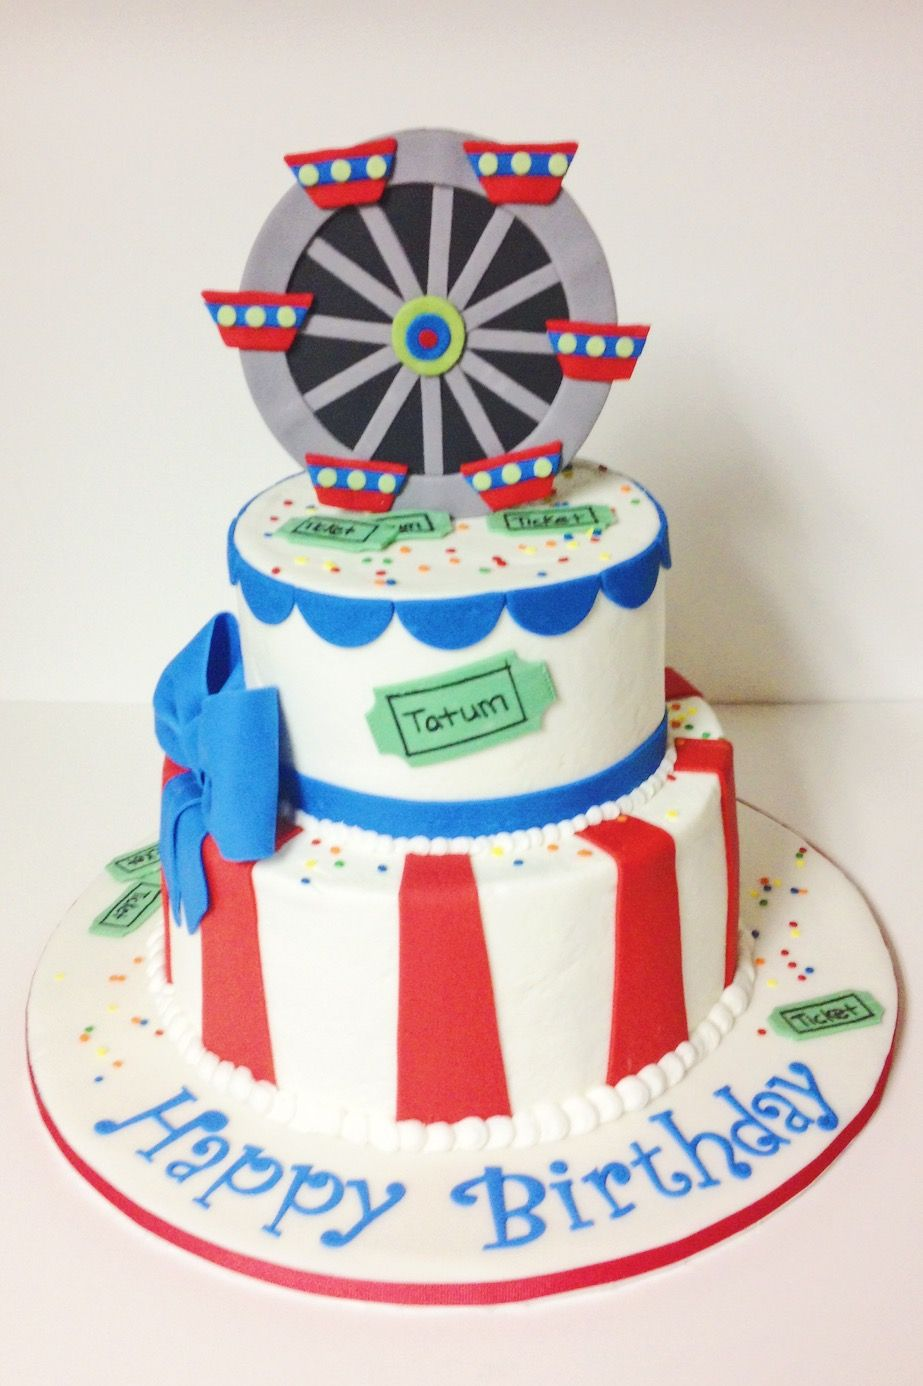 Custom Kids Birthday Cake by A Little Slice of Heaven Bakery in